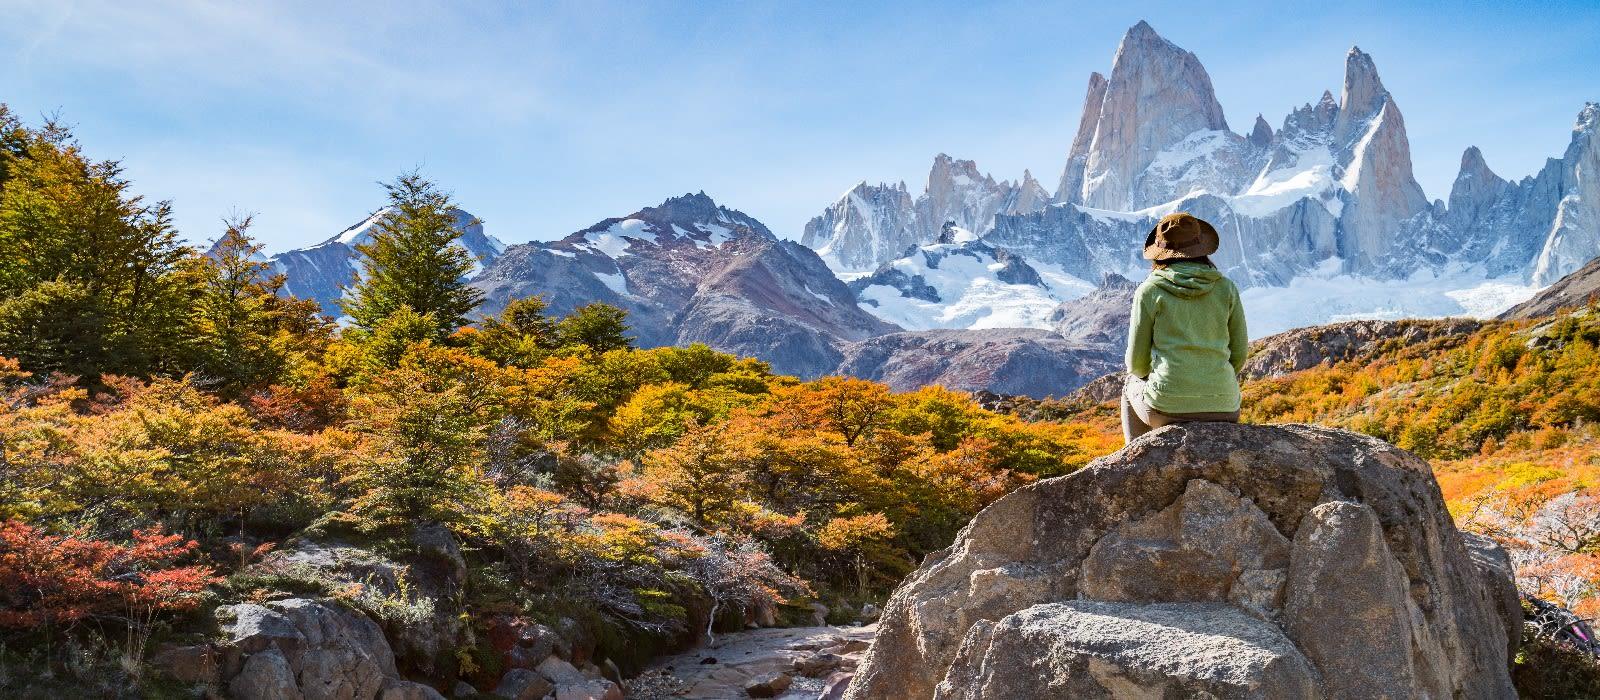 Fitz Roy Patagonia South America - Travel themes